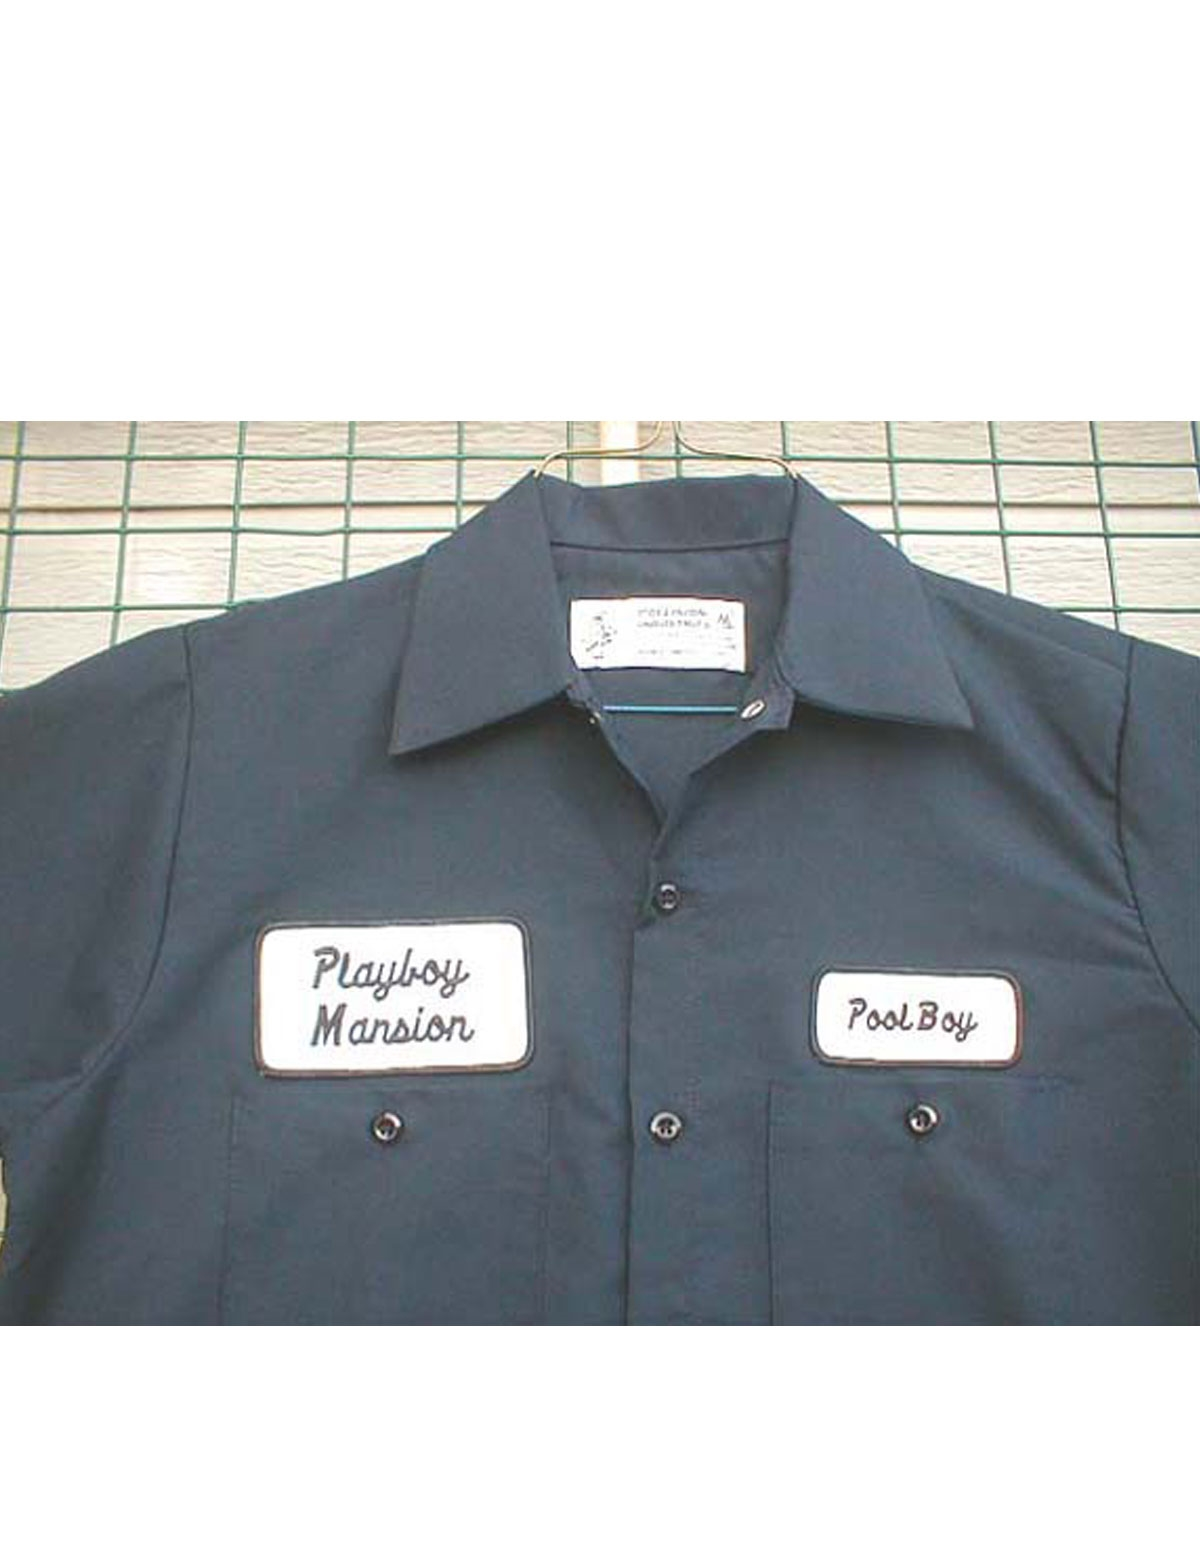 Pool Boy Work Shirt